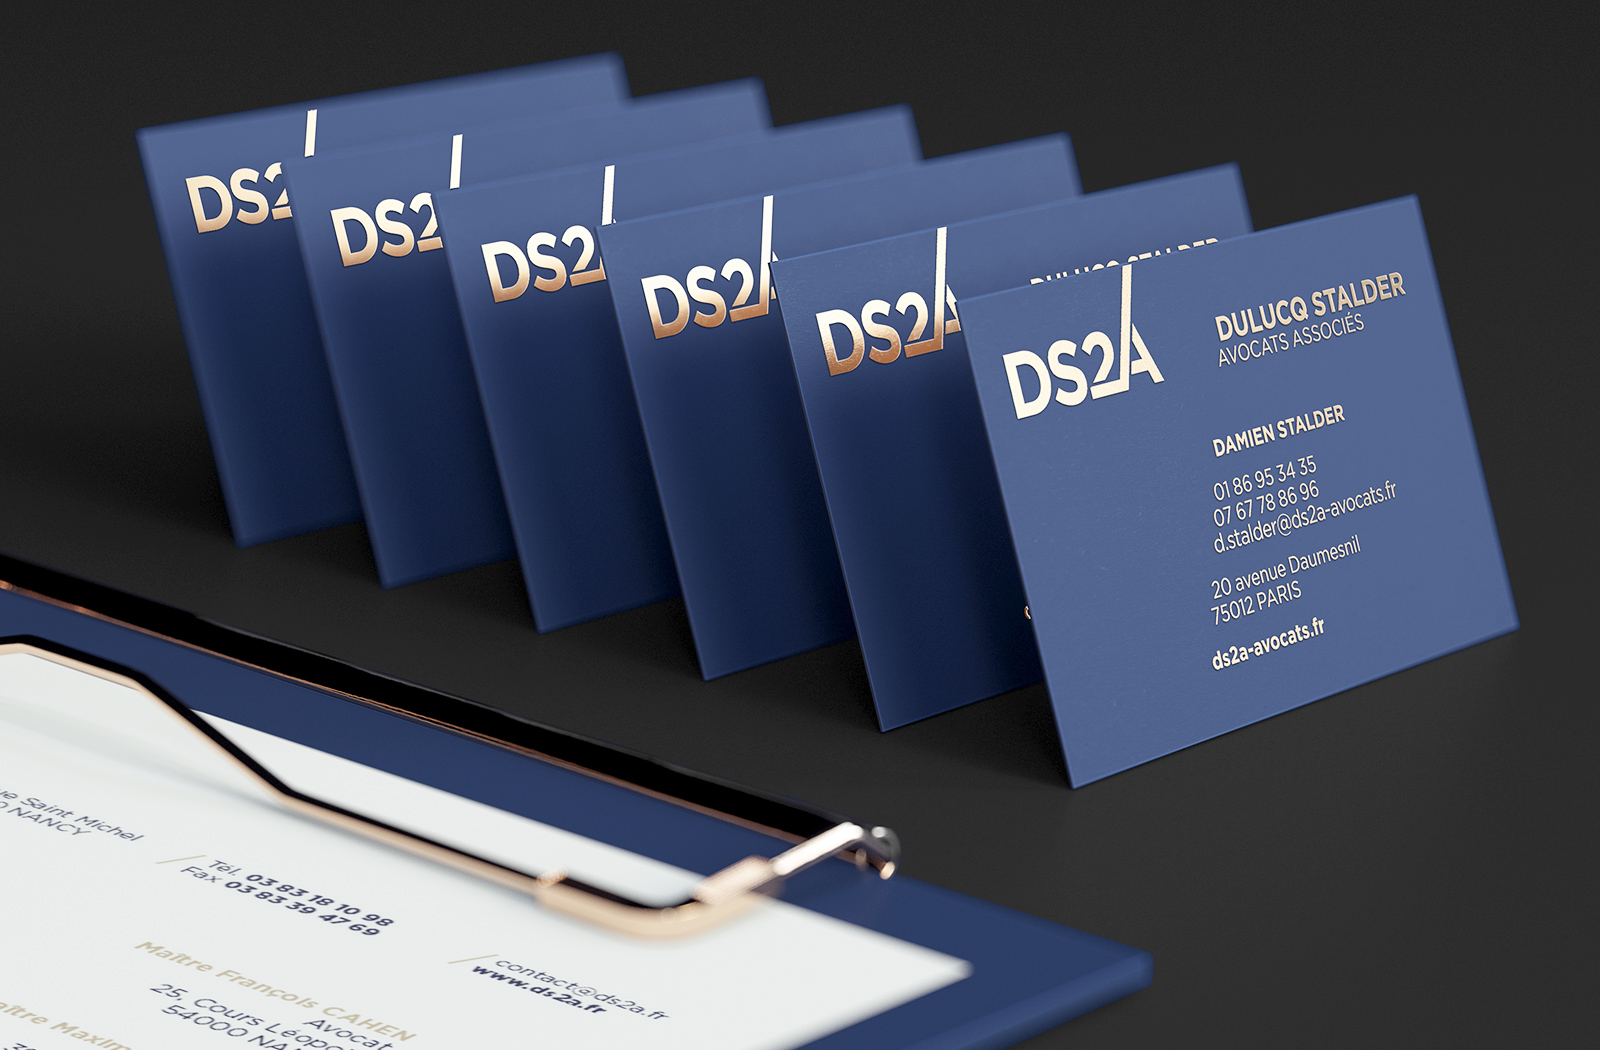 DS2A-Dulucq-stalder-avocats-branding-josselin-tourette-carte-de-visite-1